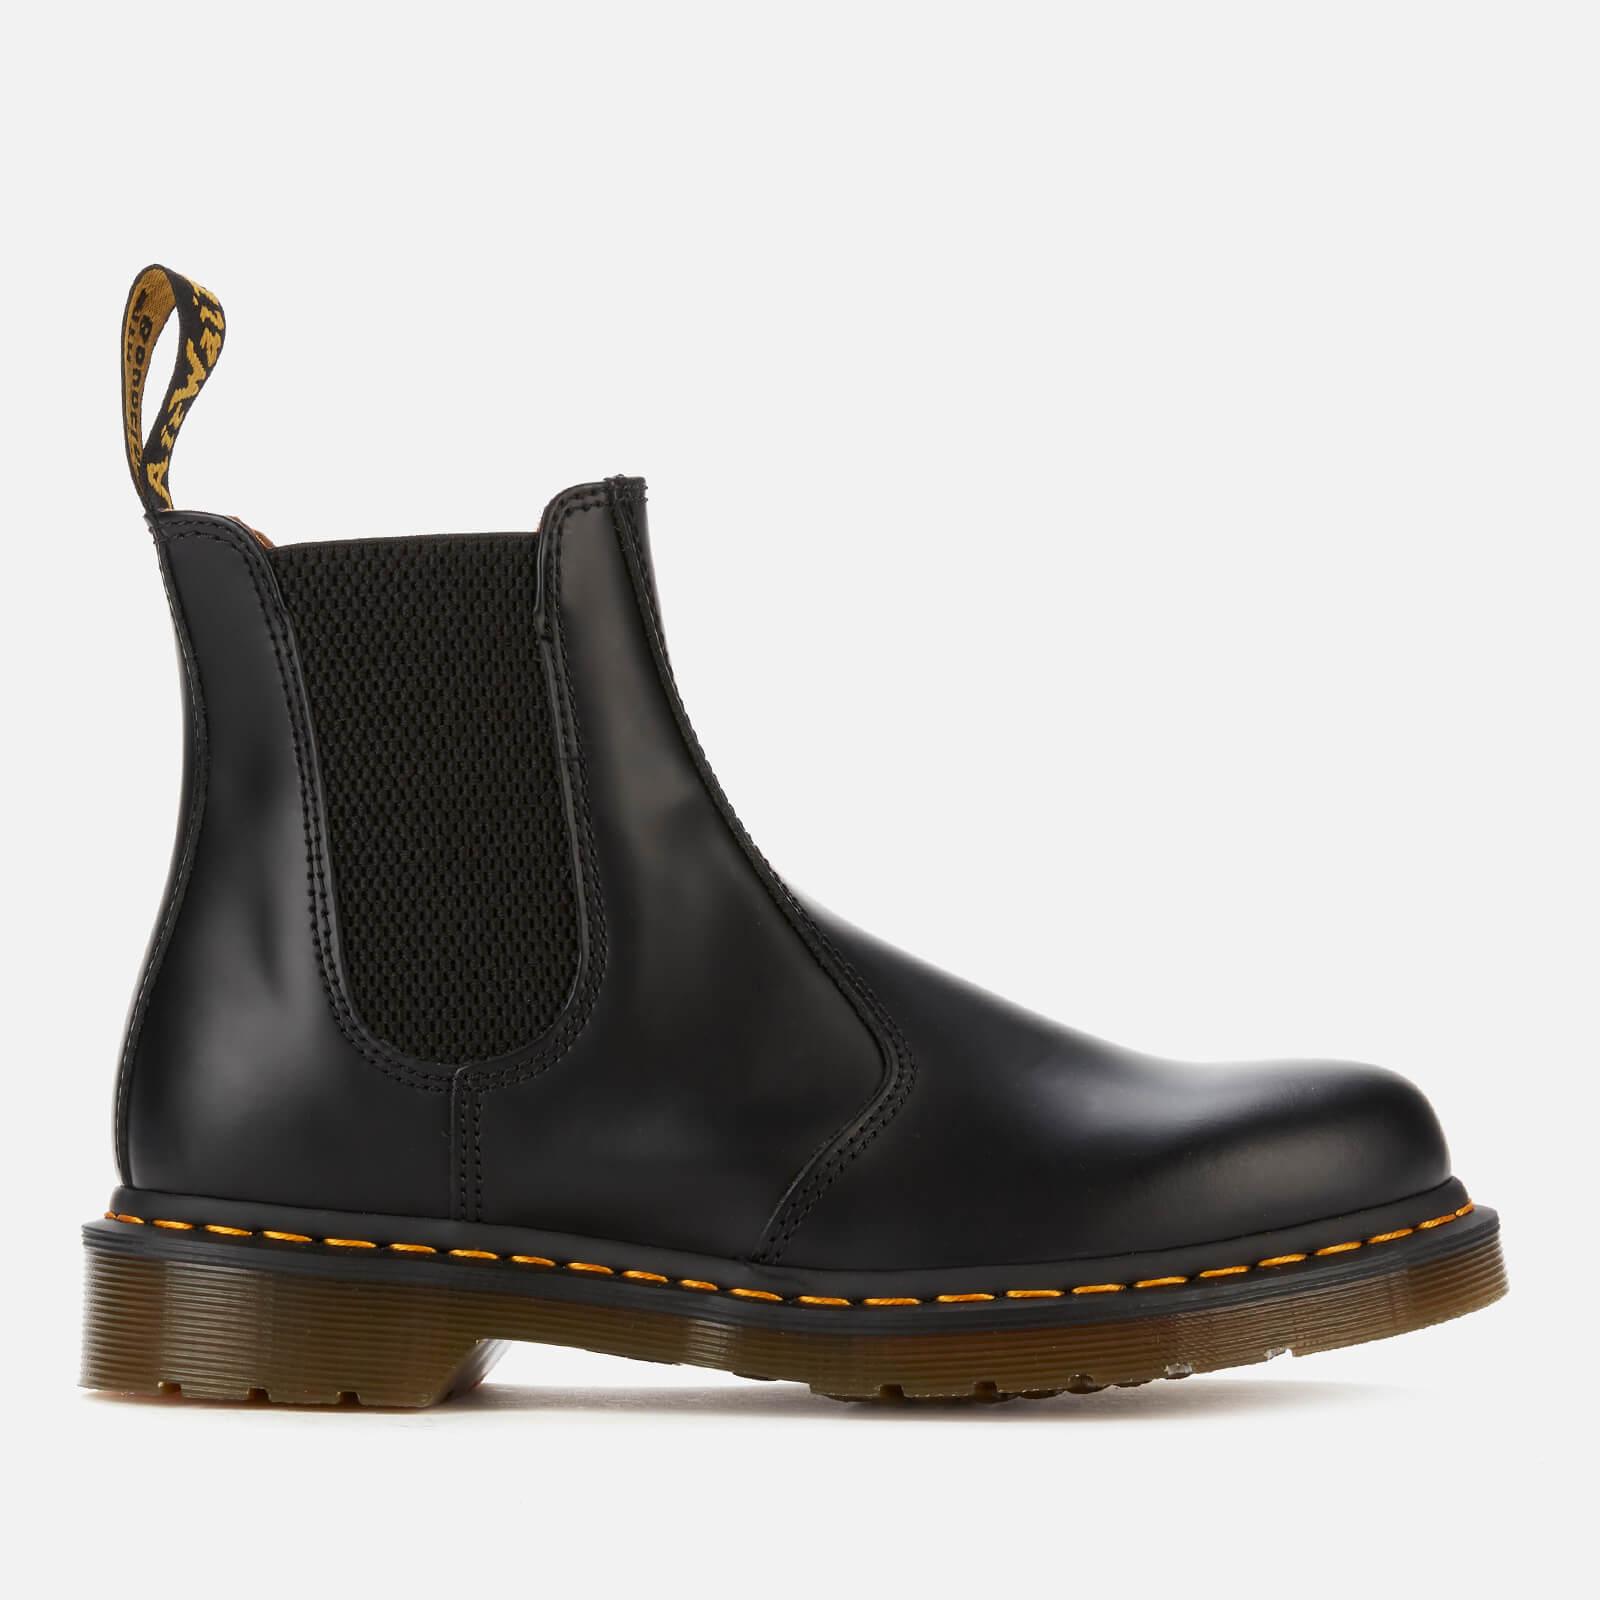 Dr.Martens 马汀博士 2976 POLISHED SMOOTH 中性款真皮切尔西靴